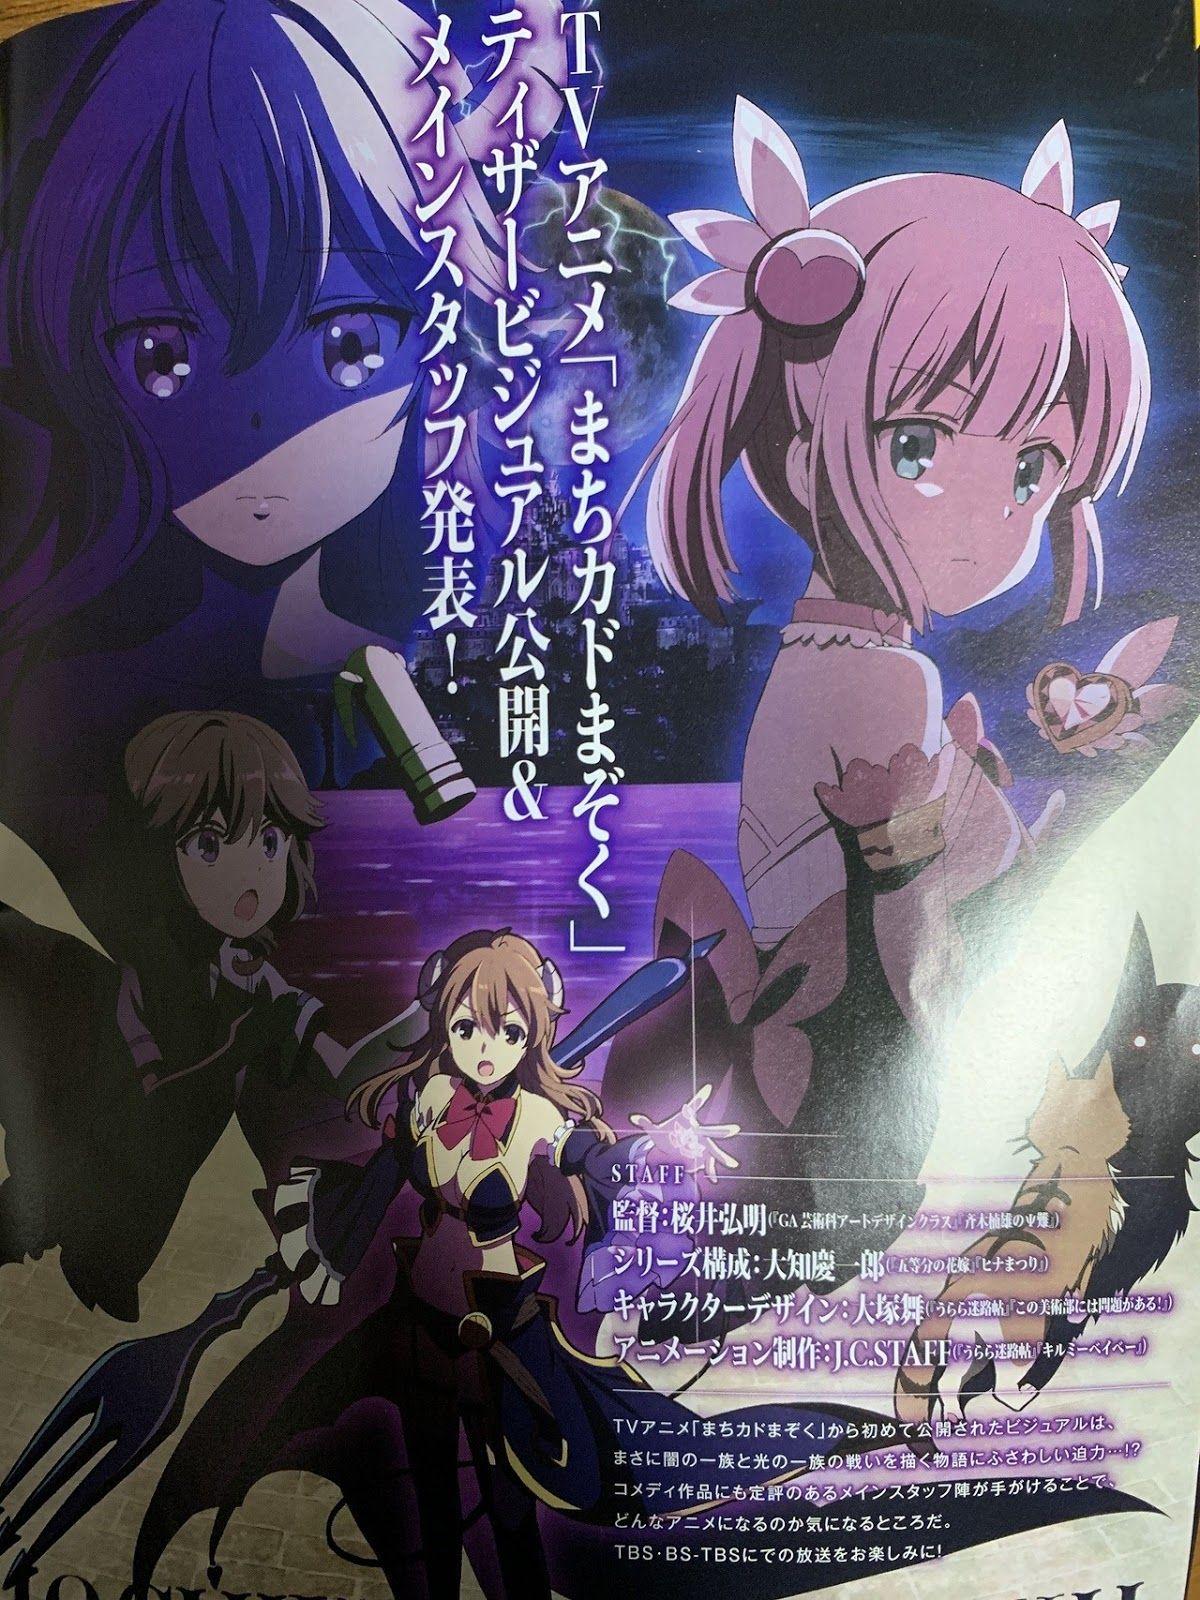 el anime machikado mazoku desvela poster oficial staff de animacion anime aesthetic anime kawaii anime